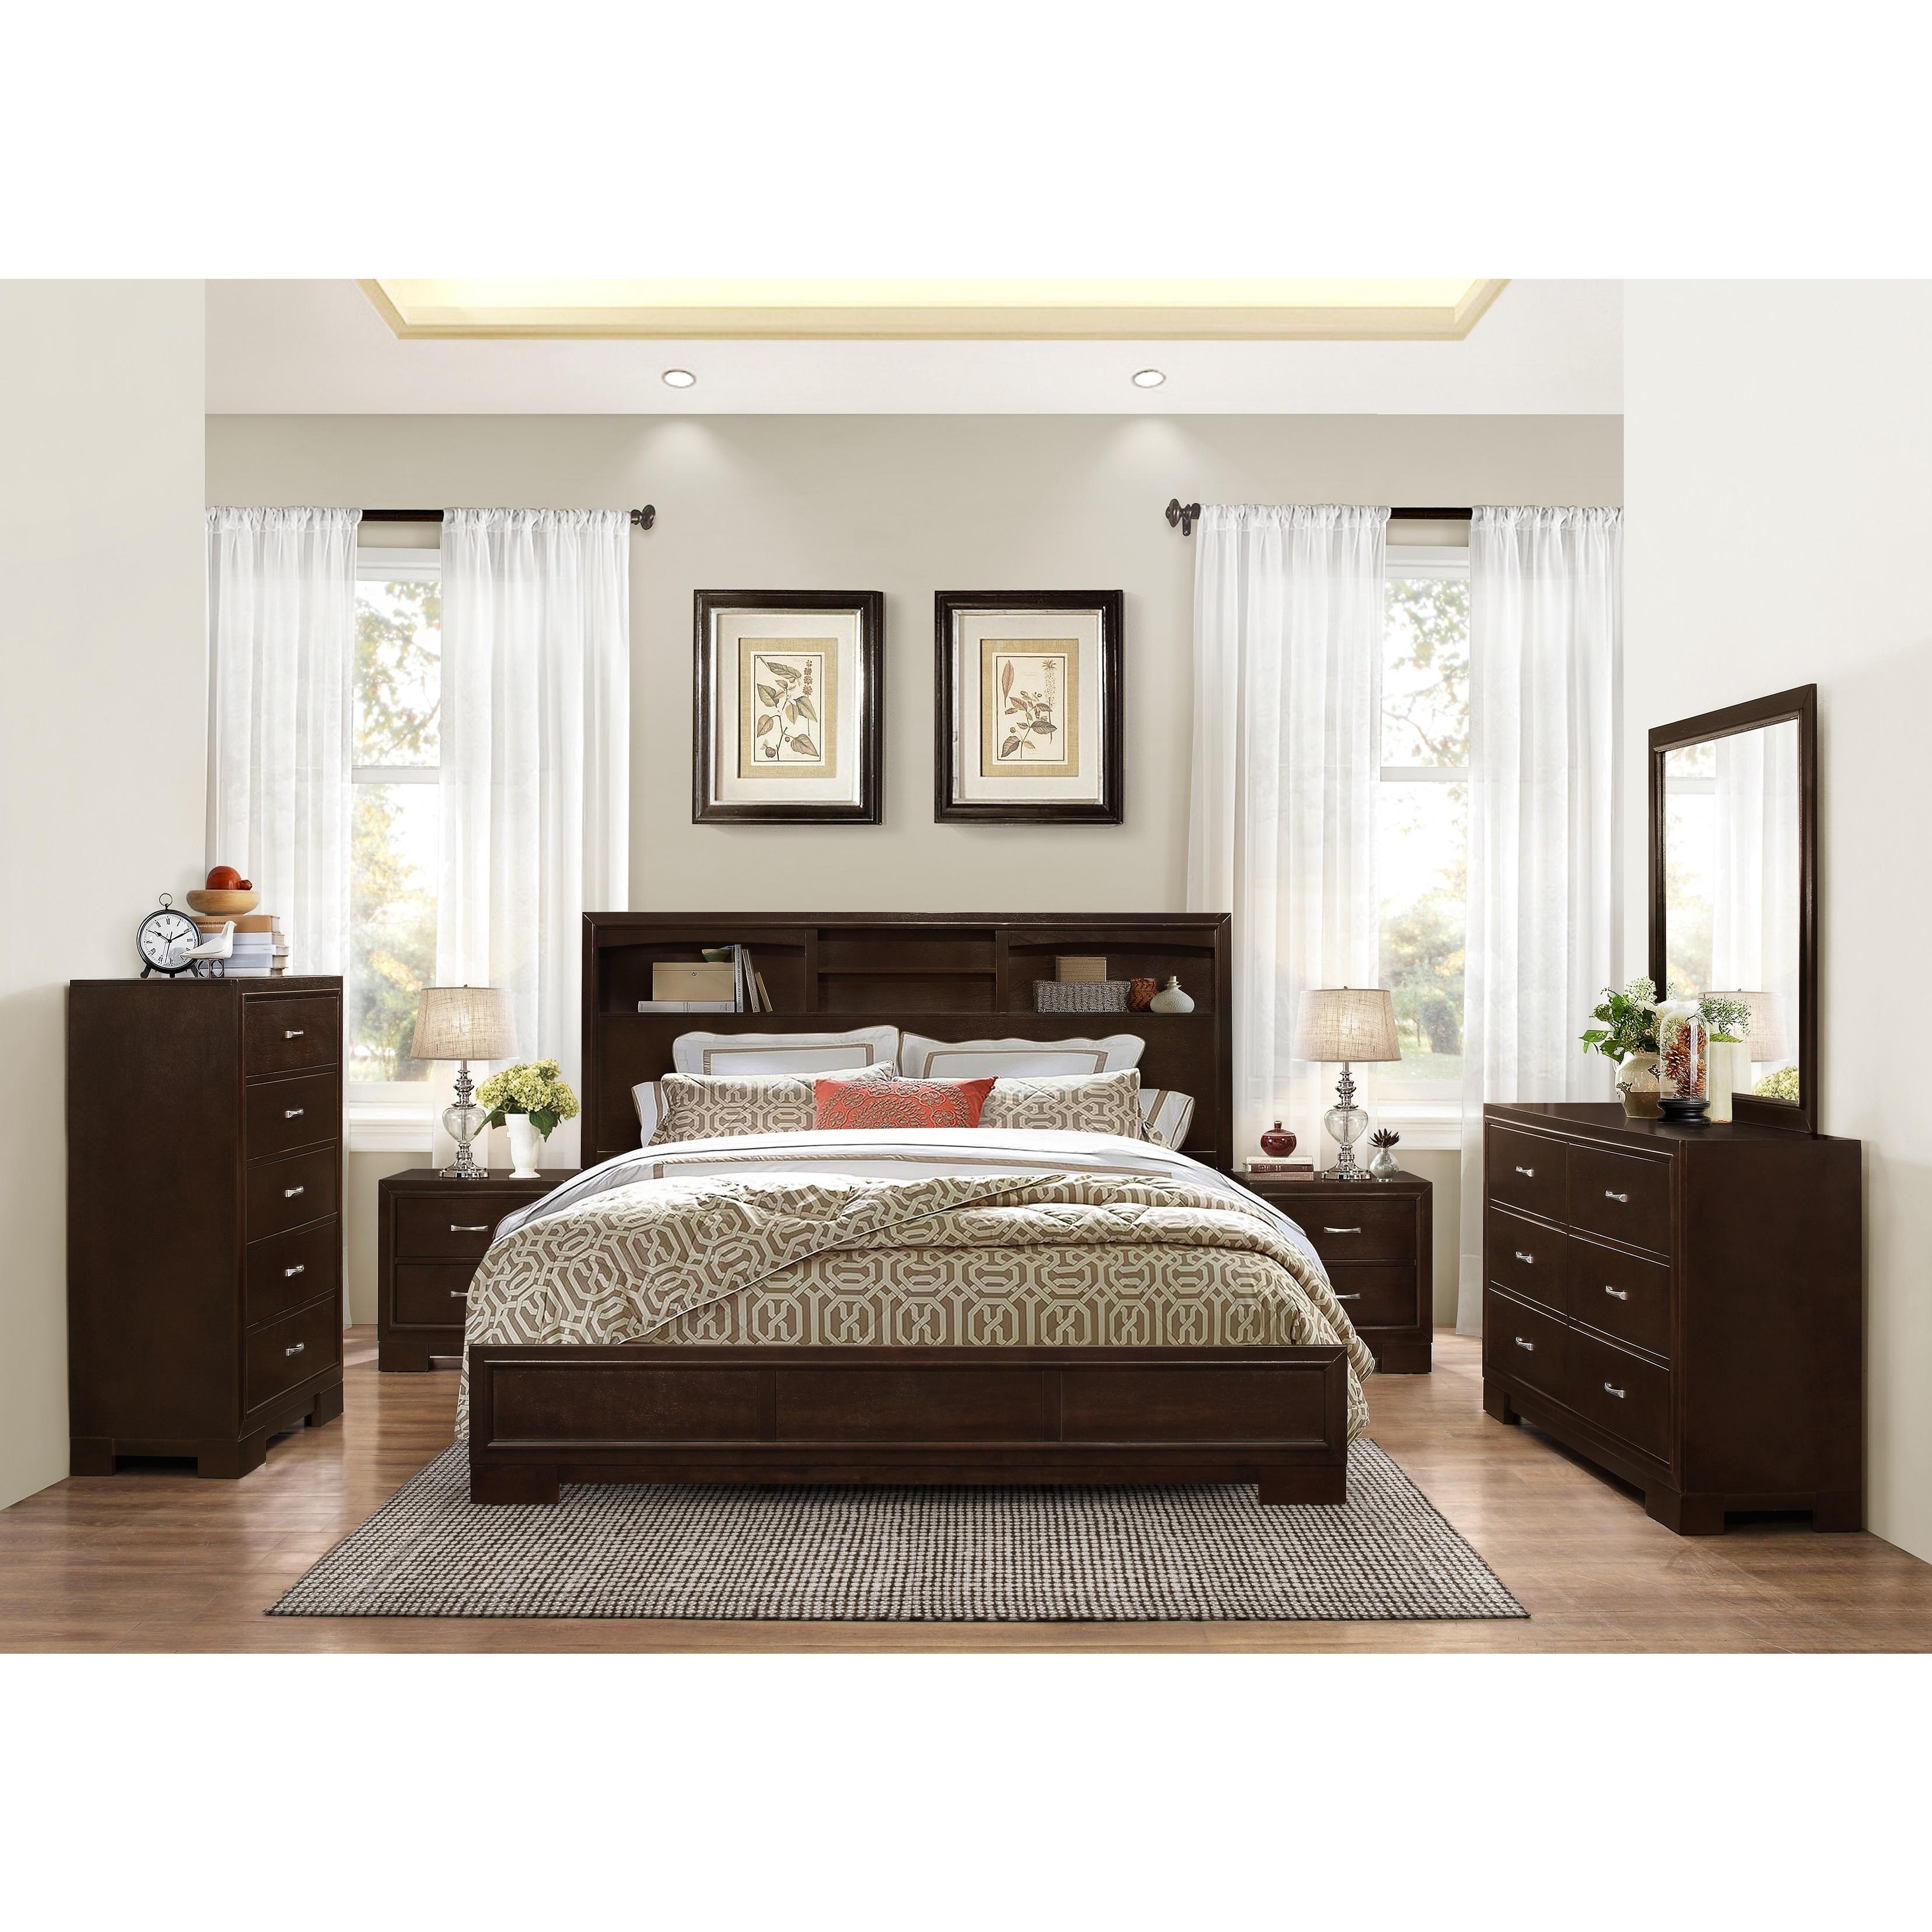 Montana Walnut Modern 4-Piece Wood Bedroom Set with King Bed, Dresser,  Mirror, 2 Nightstands, Chest